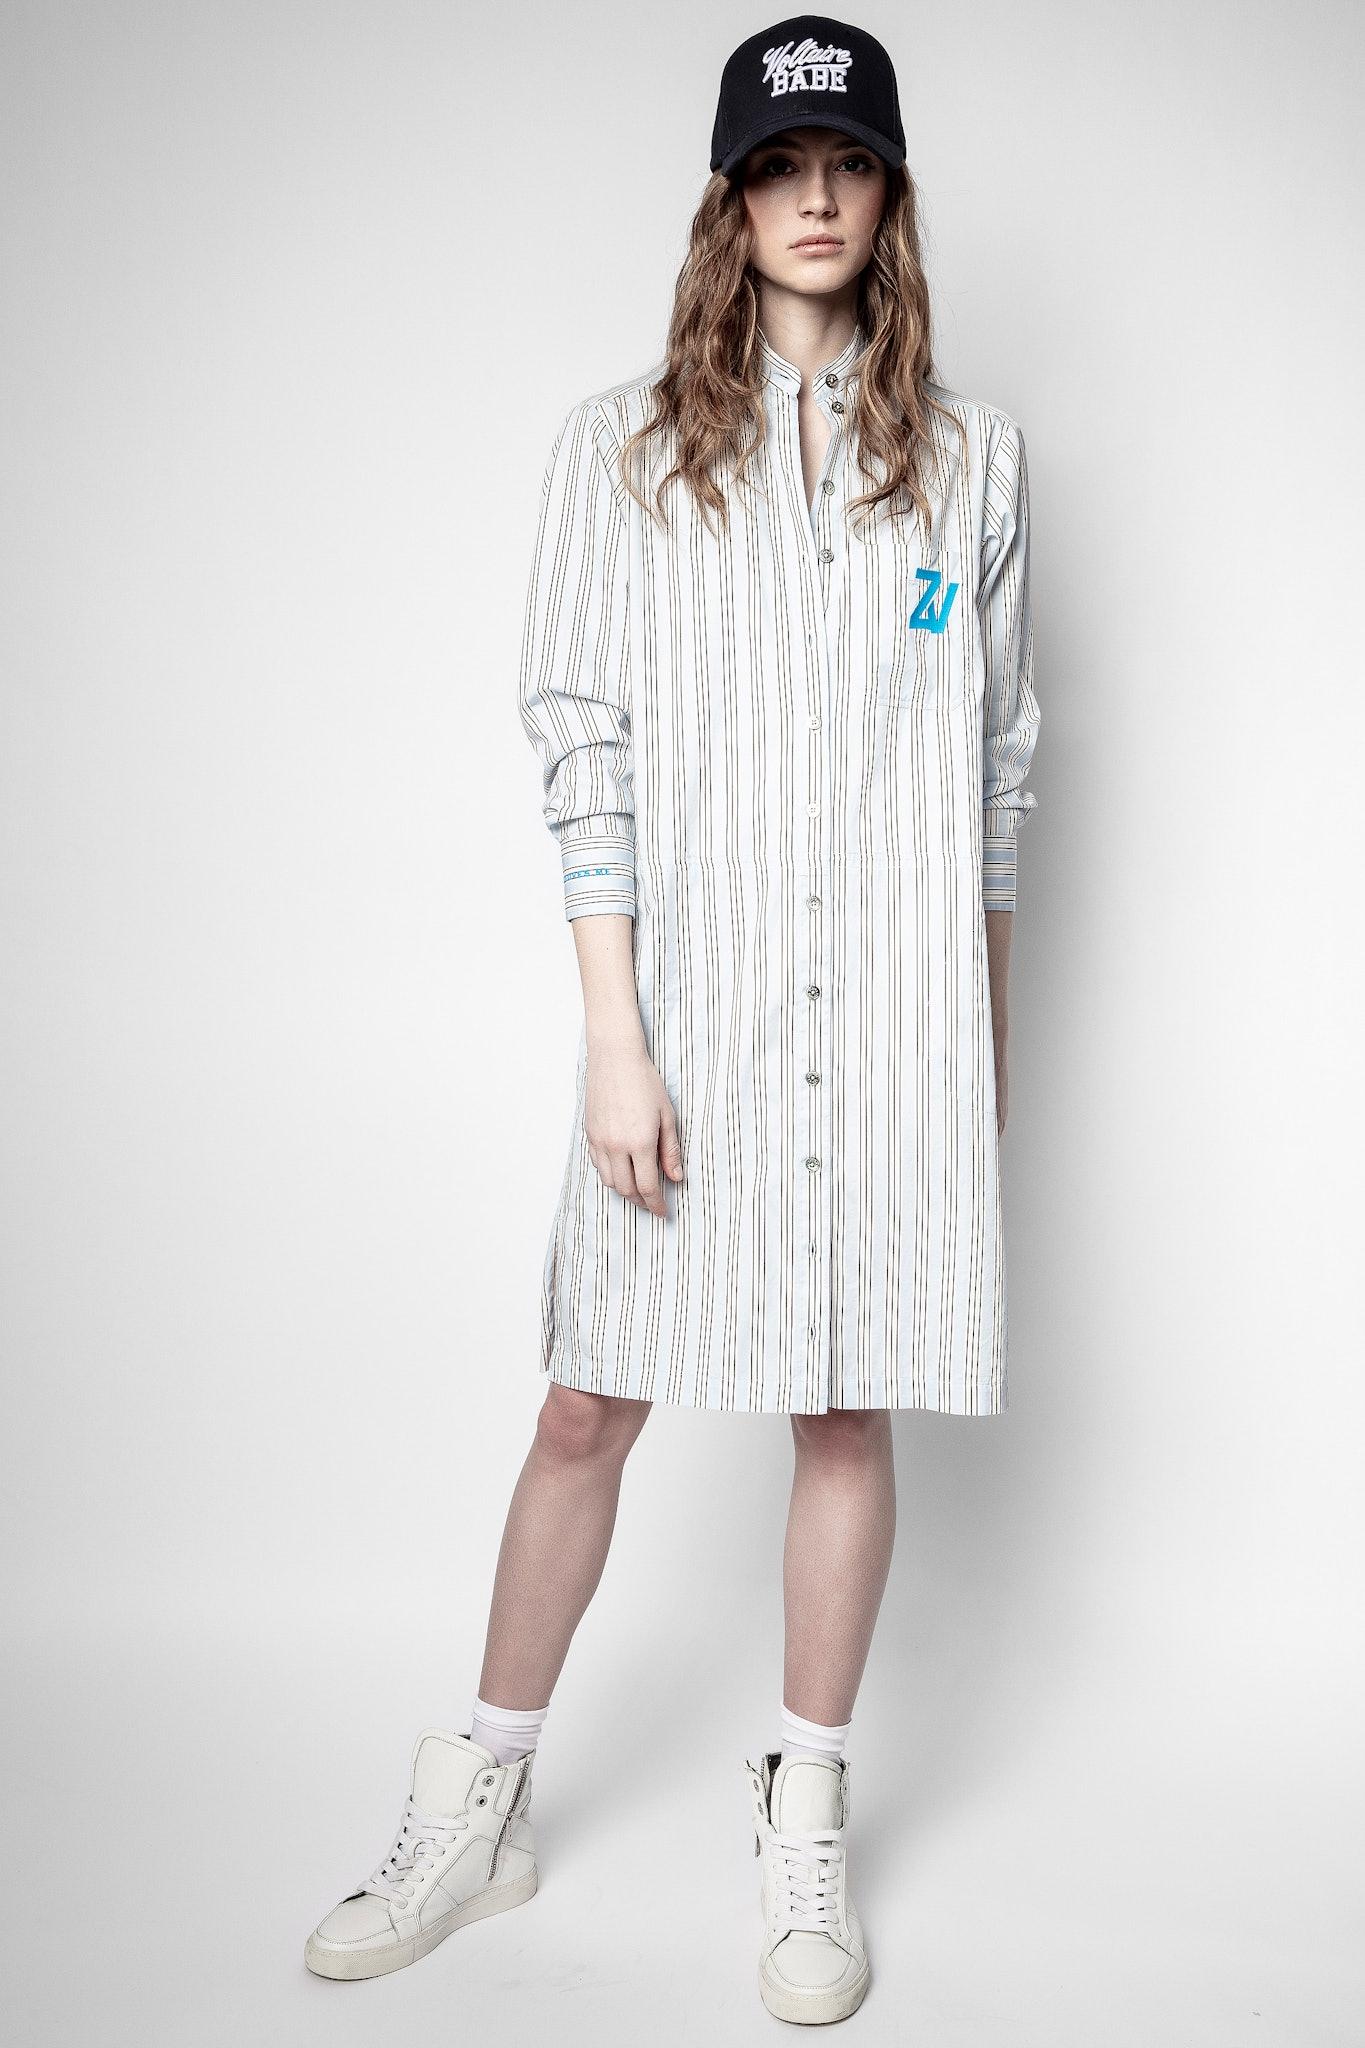 Ryane Raye Dress